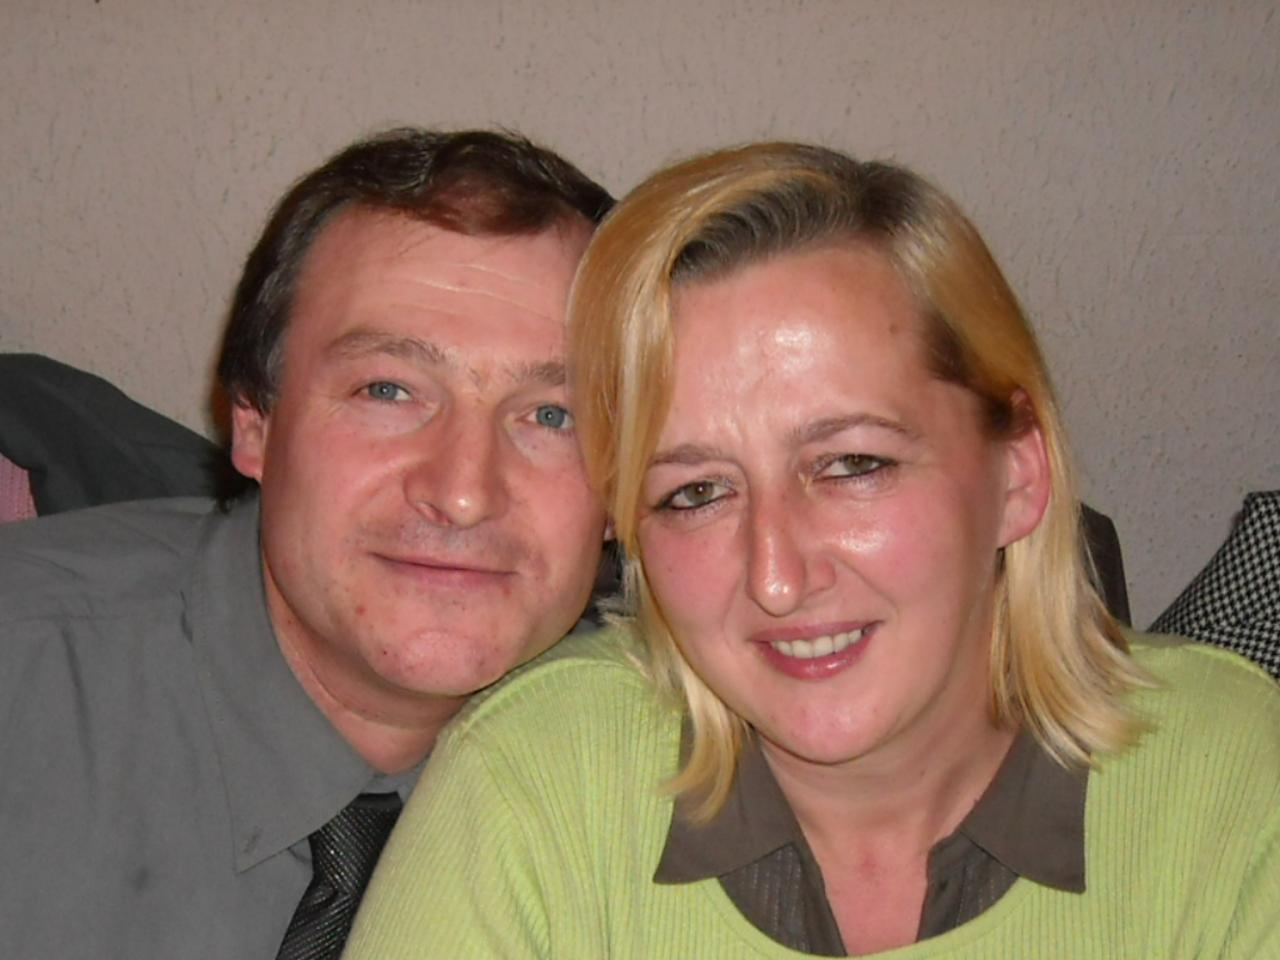 Mr et Mme jurgawczynski